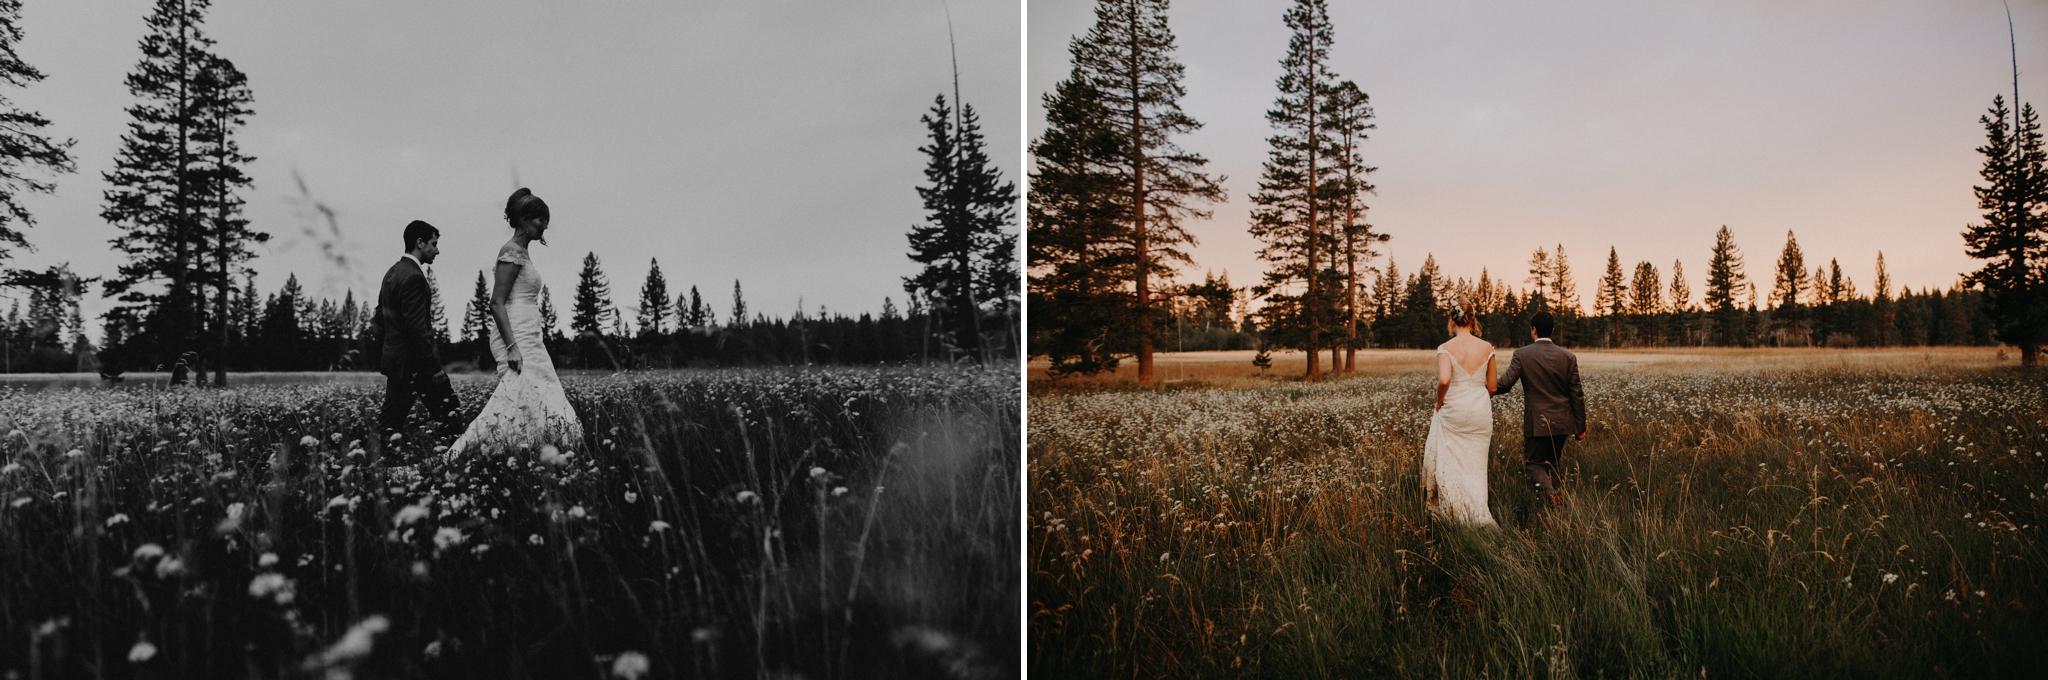 tahoe-wedding-photographer14.jpg